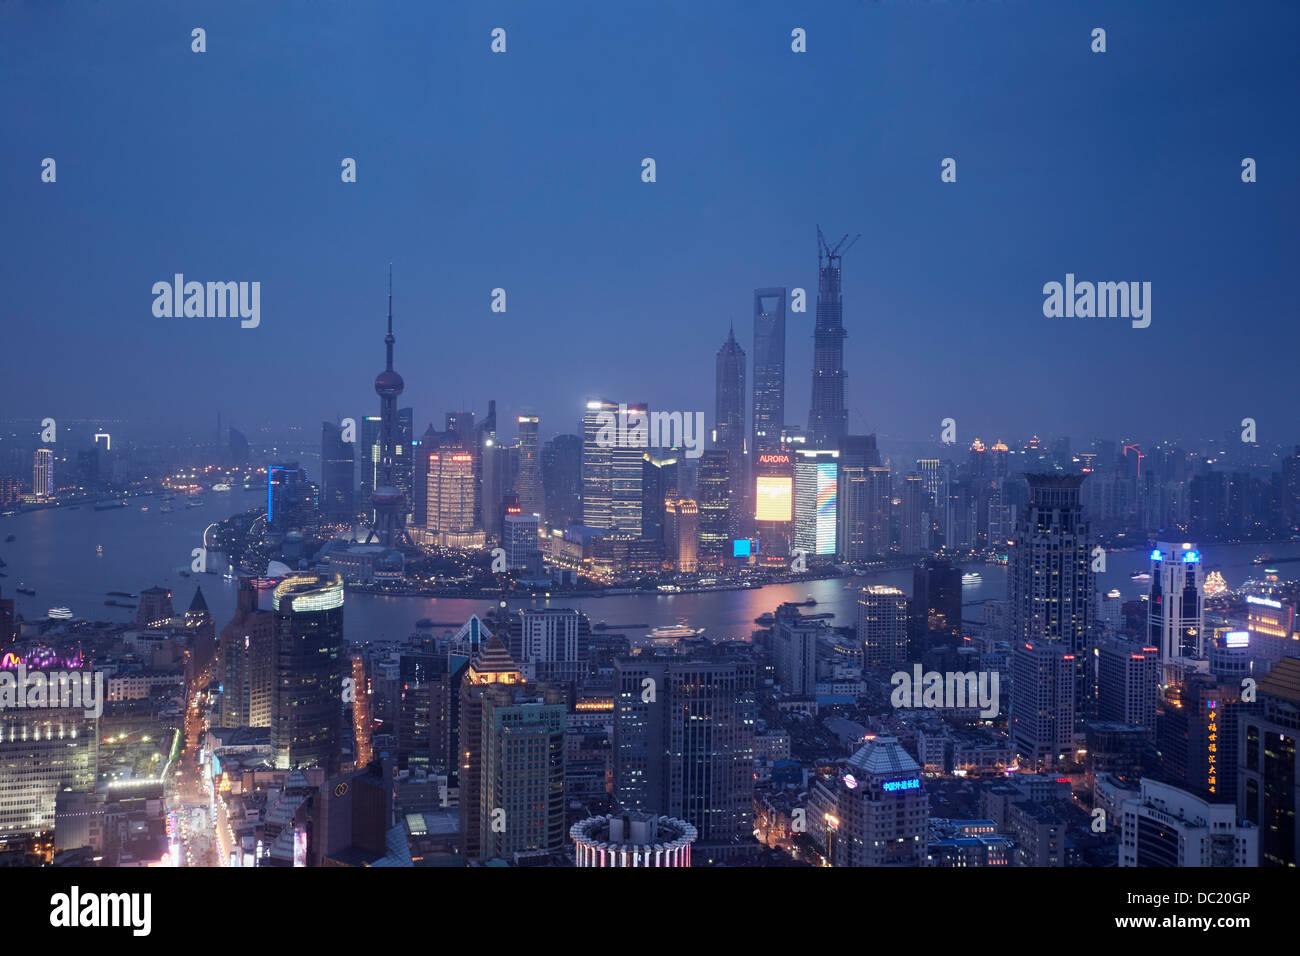 Cityscape of Shanghai at night, China - Stock Image